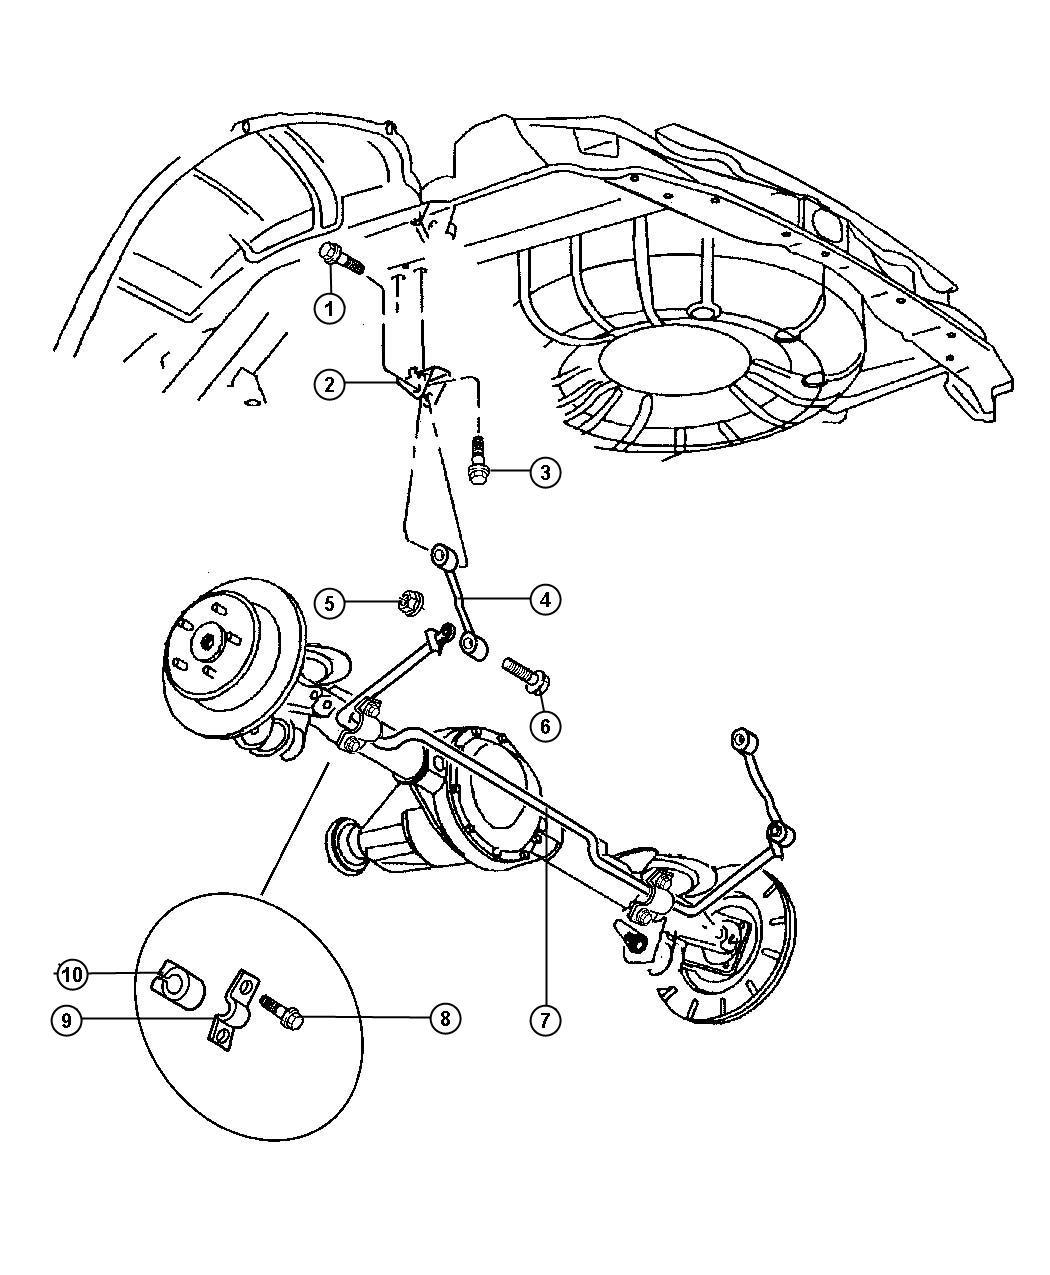 Chrysler Pacifica Front Suspension Diagram